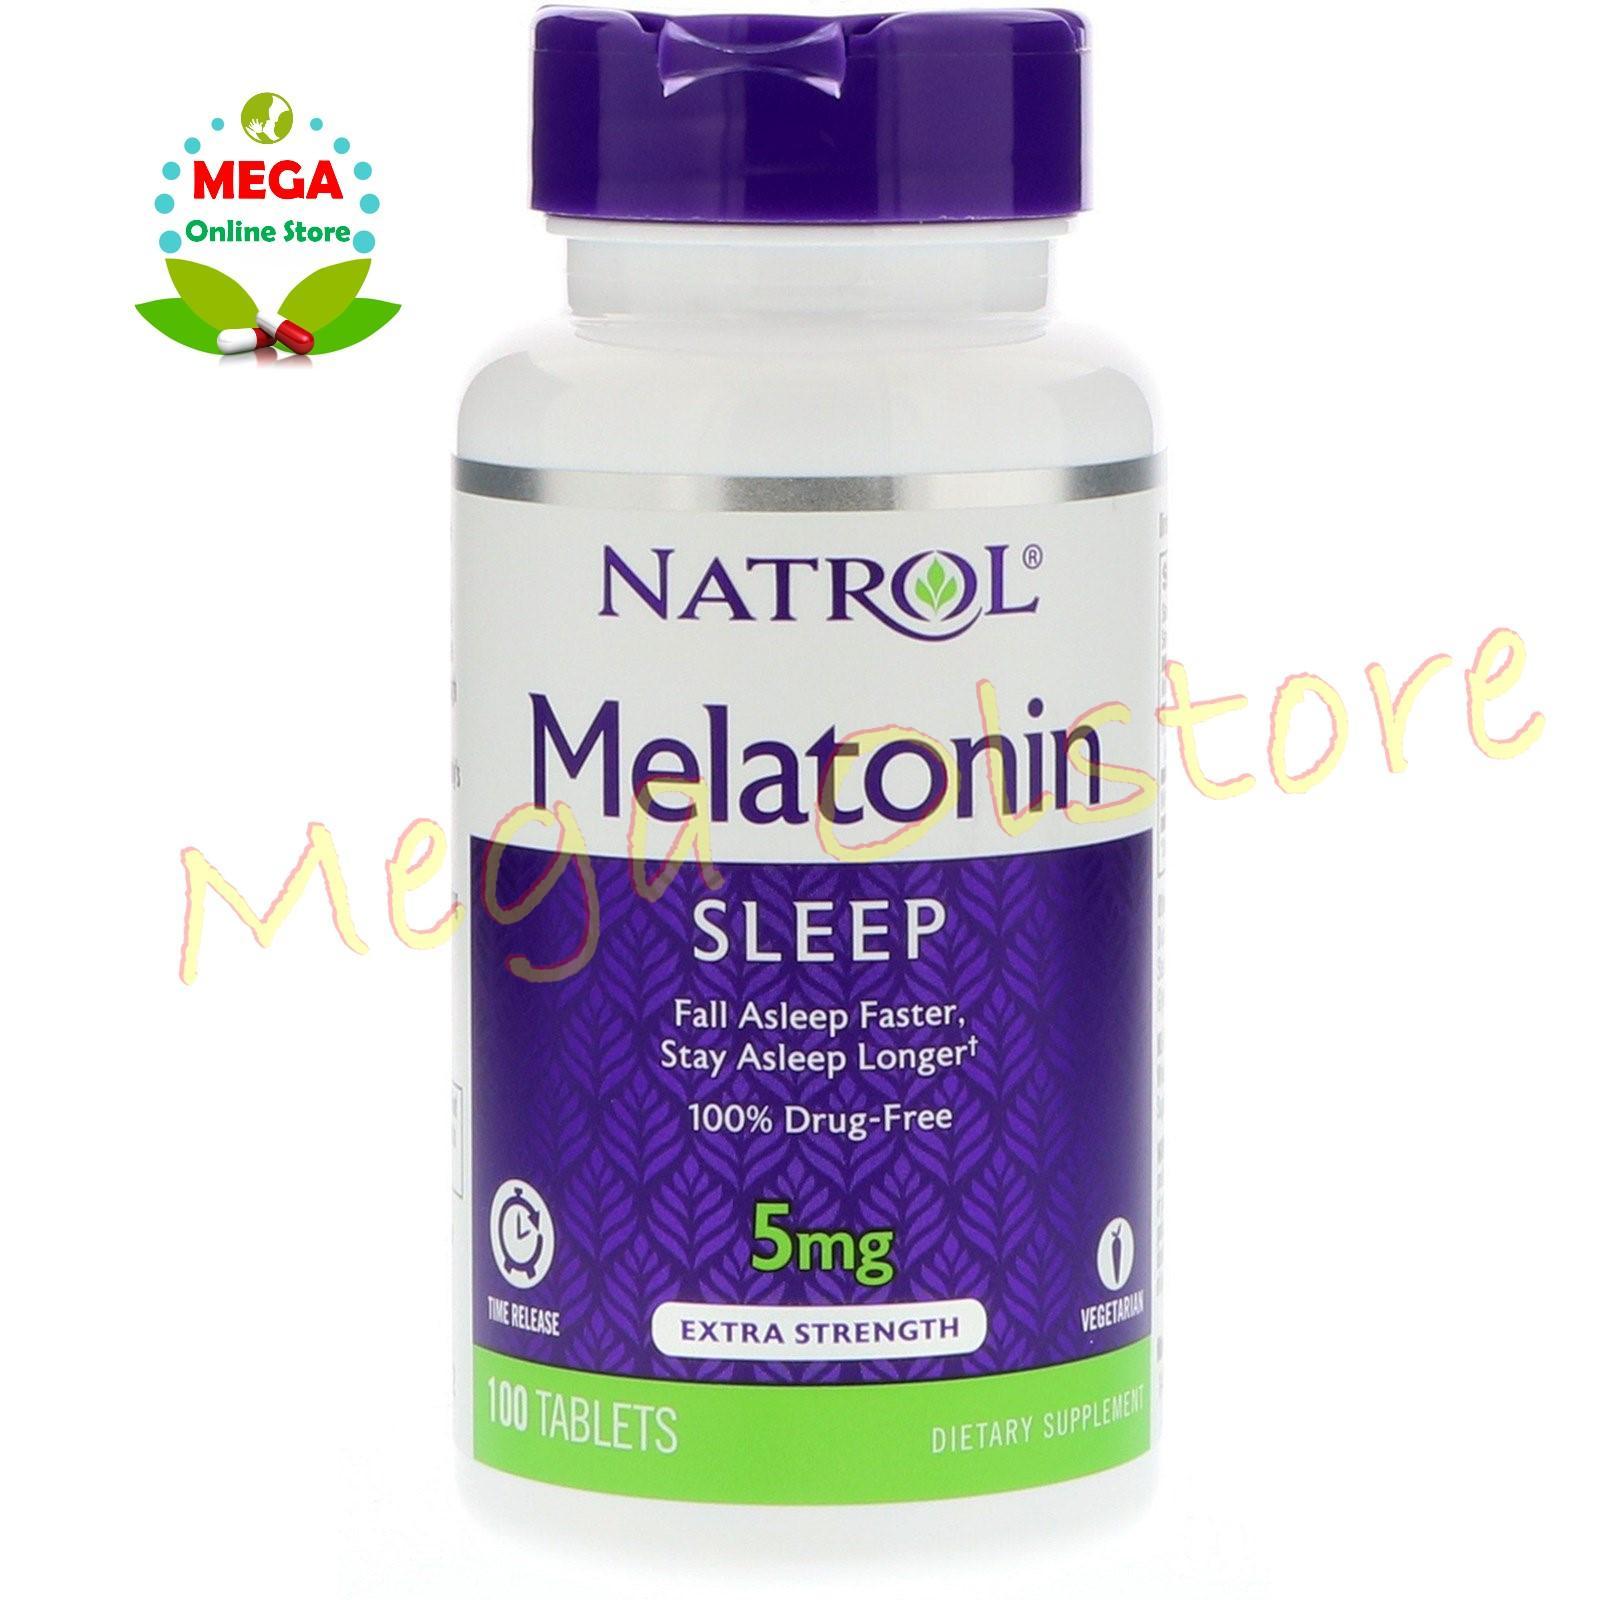 Obat Stress Anti Depresi Bio Mega Kaplet 1 Strip Isi 10 Natrol Melatonin Tr Time Release 5 Mg 100 Tablet